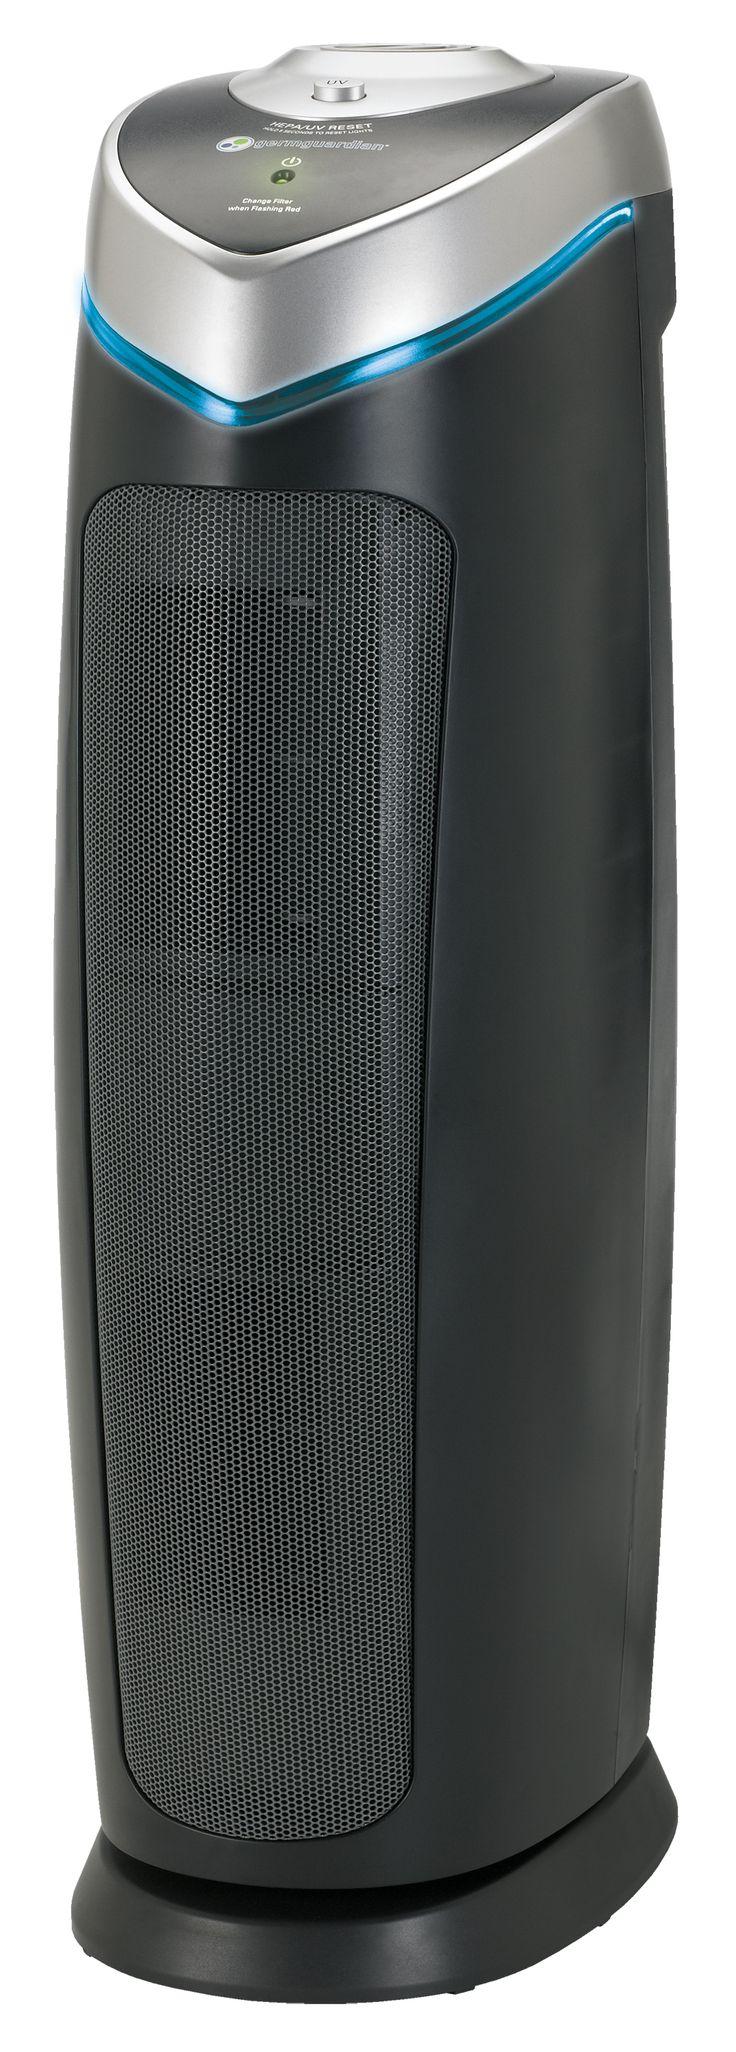 GermGuardian AC4825 3in1 Air Purifier with True HEPA